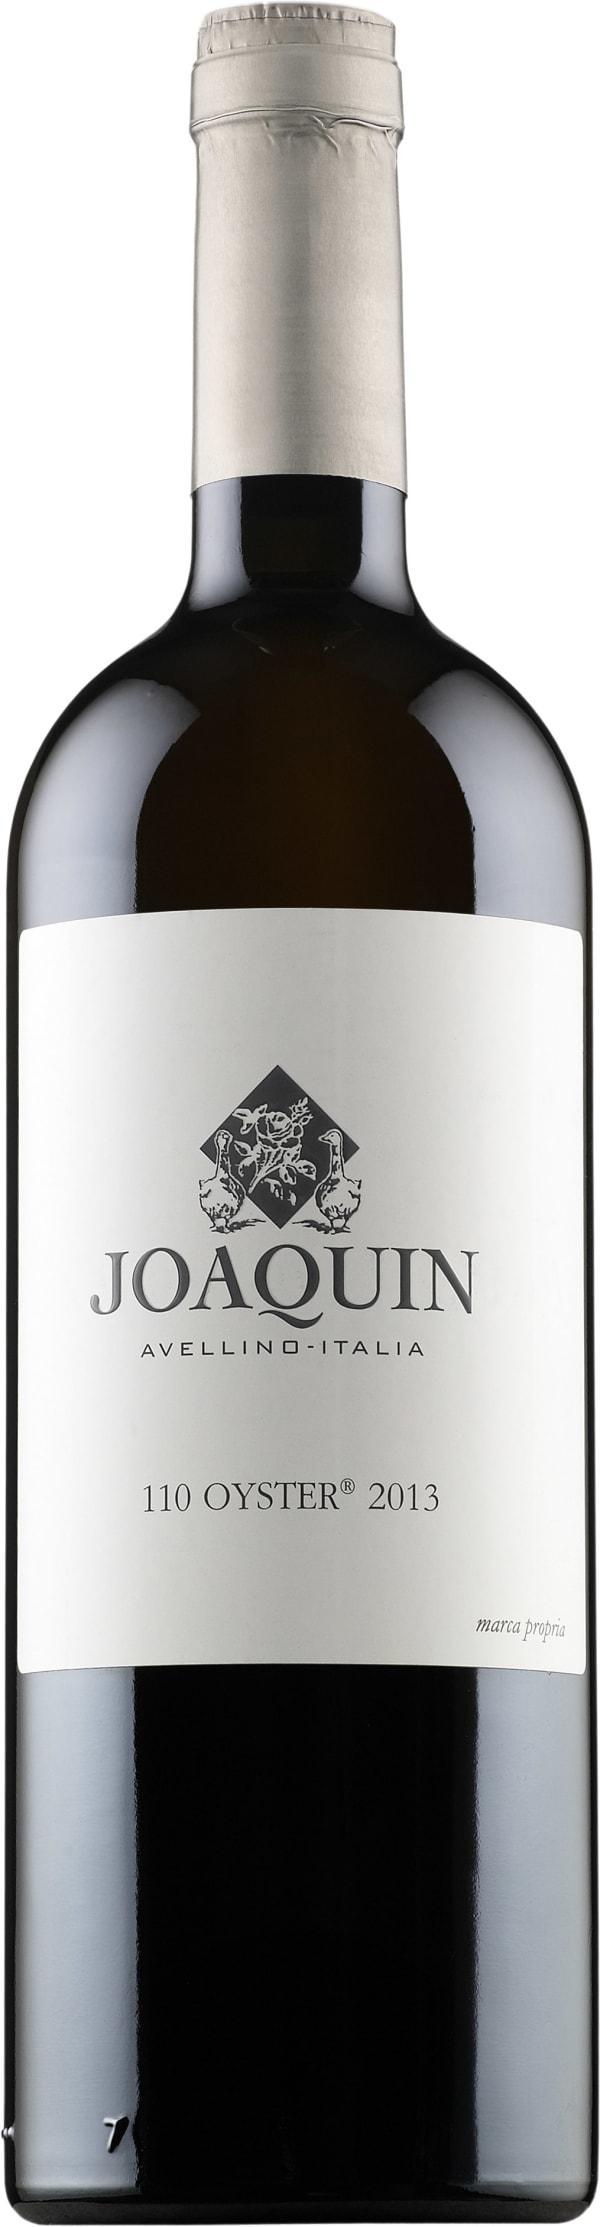 Joaquin 110 Oyster Greco 2013